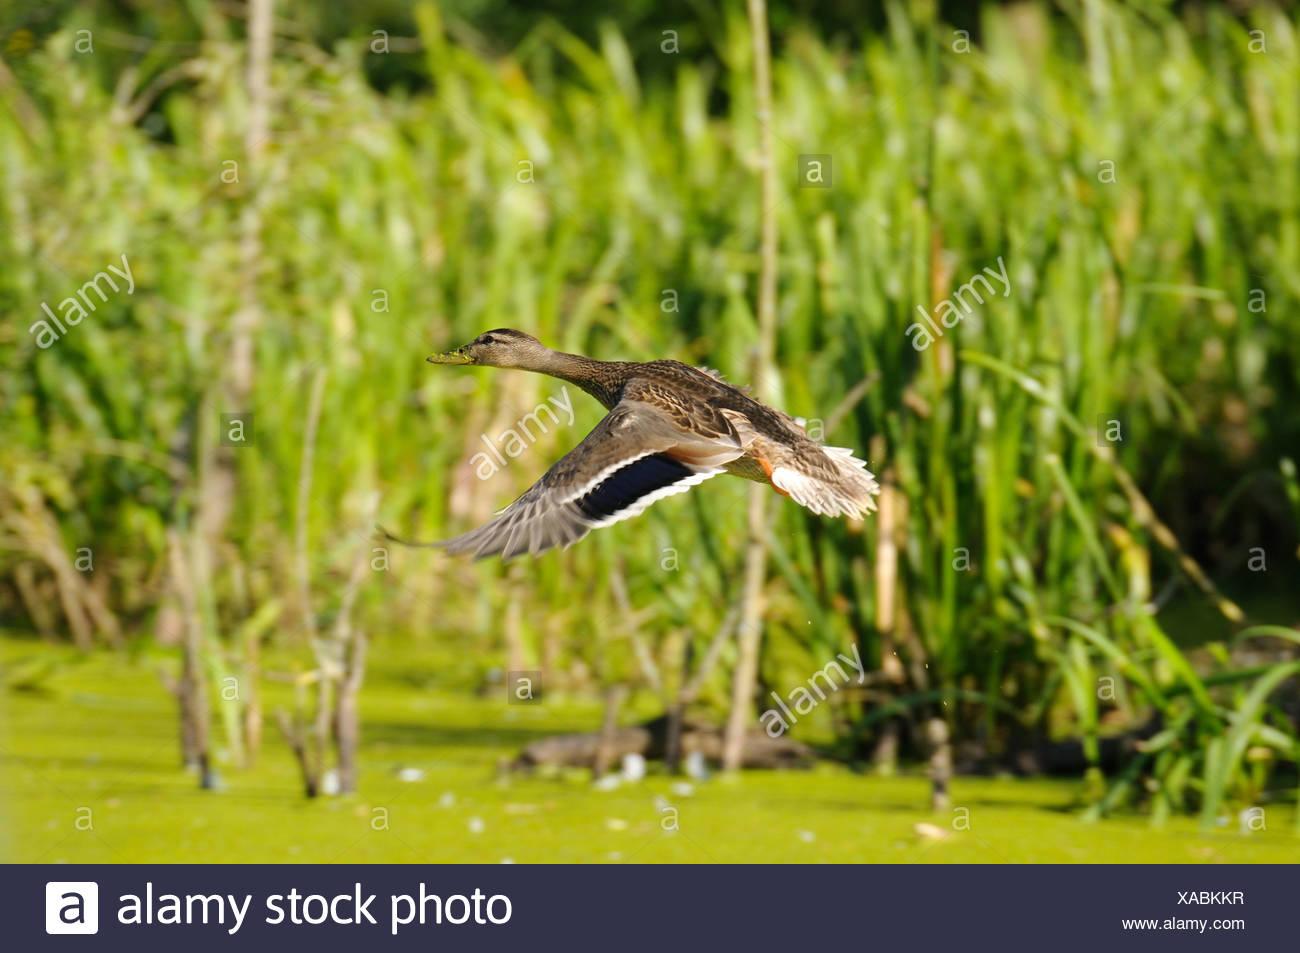 Mallard duck (Anas platyrhynchos) flying, side view - Stock Image